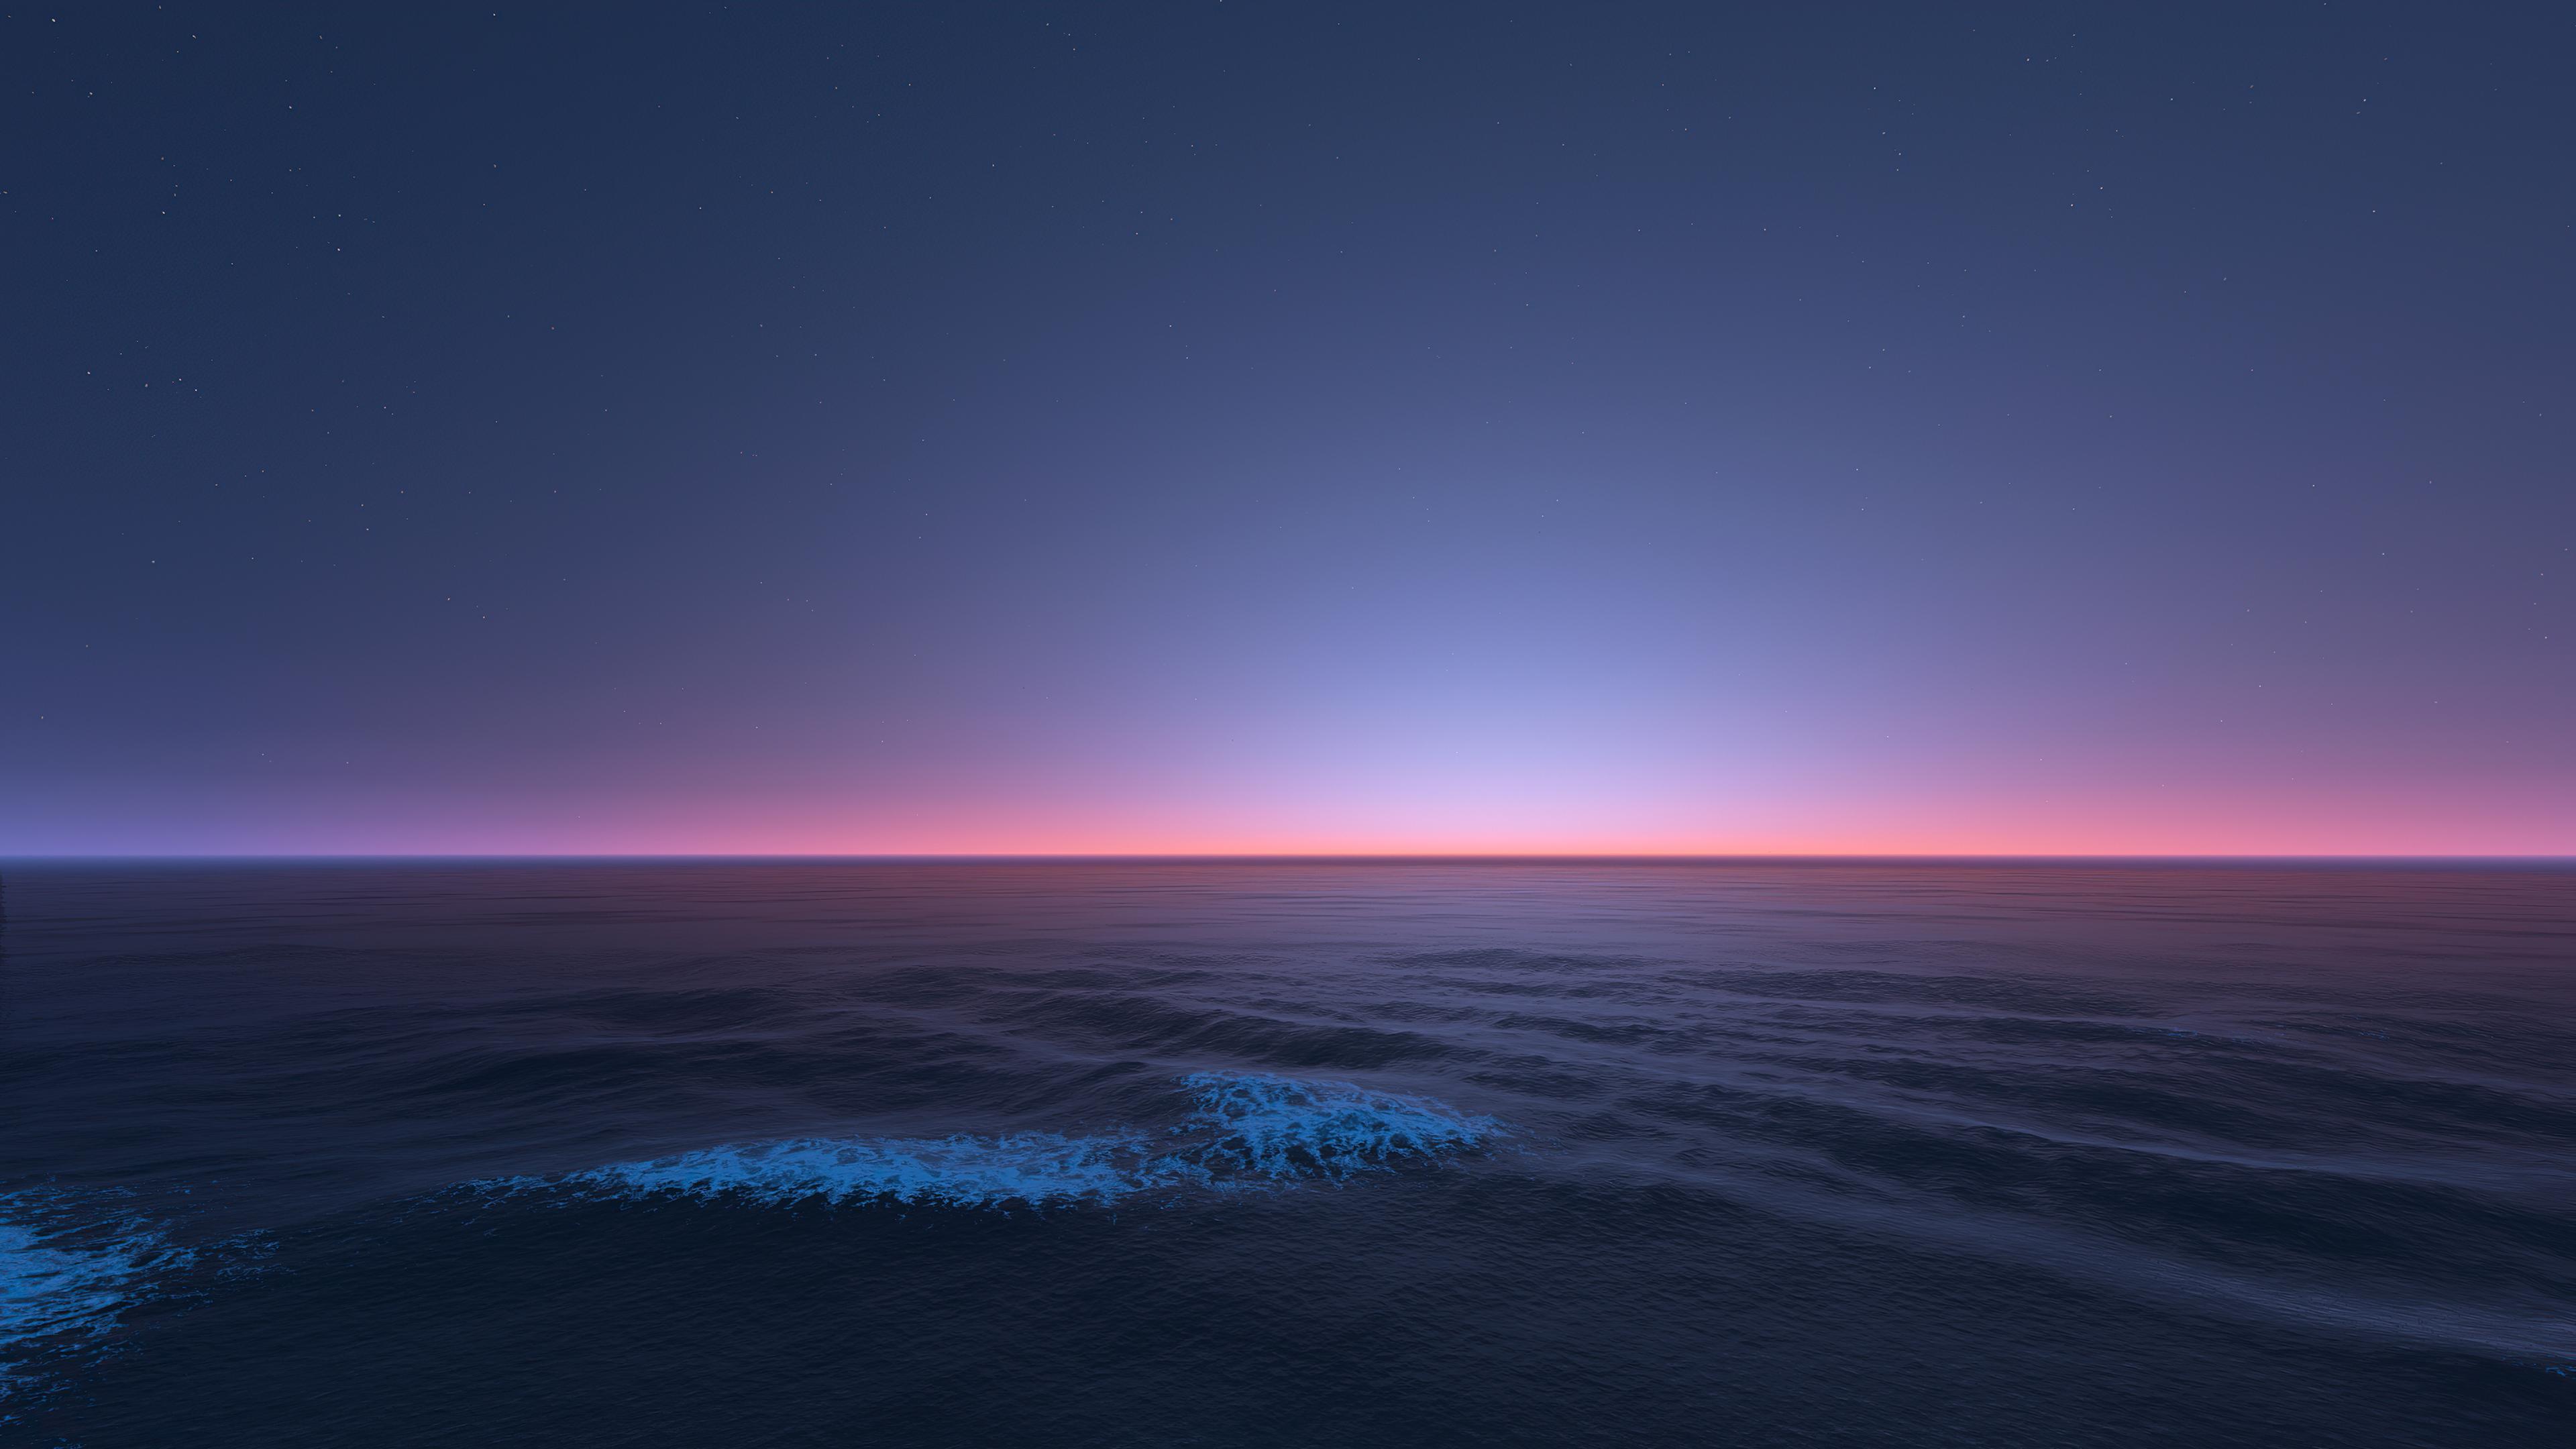 silent sea 4k 1602501691 - Silent Sea 4k - Silent Sea 4k wallpapers